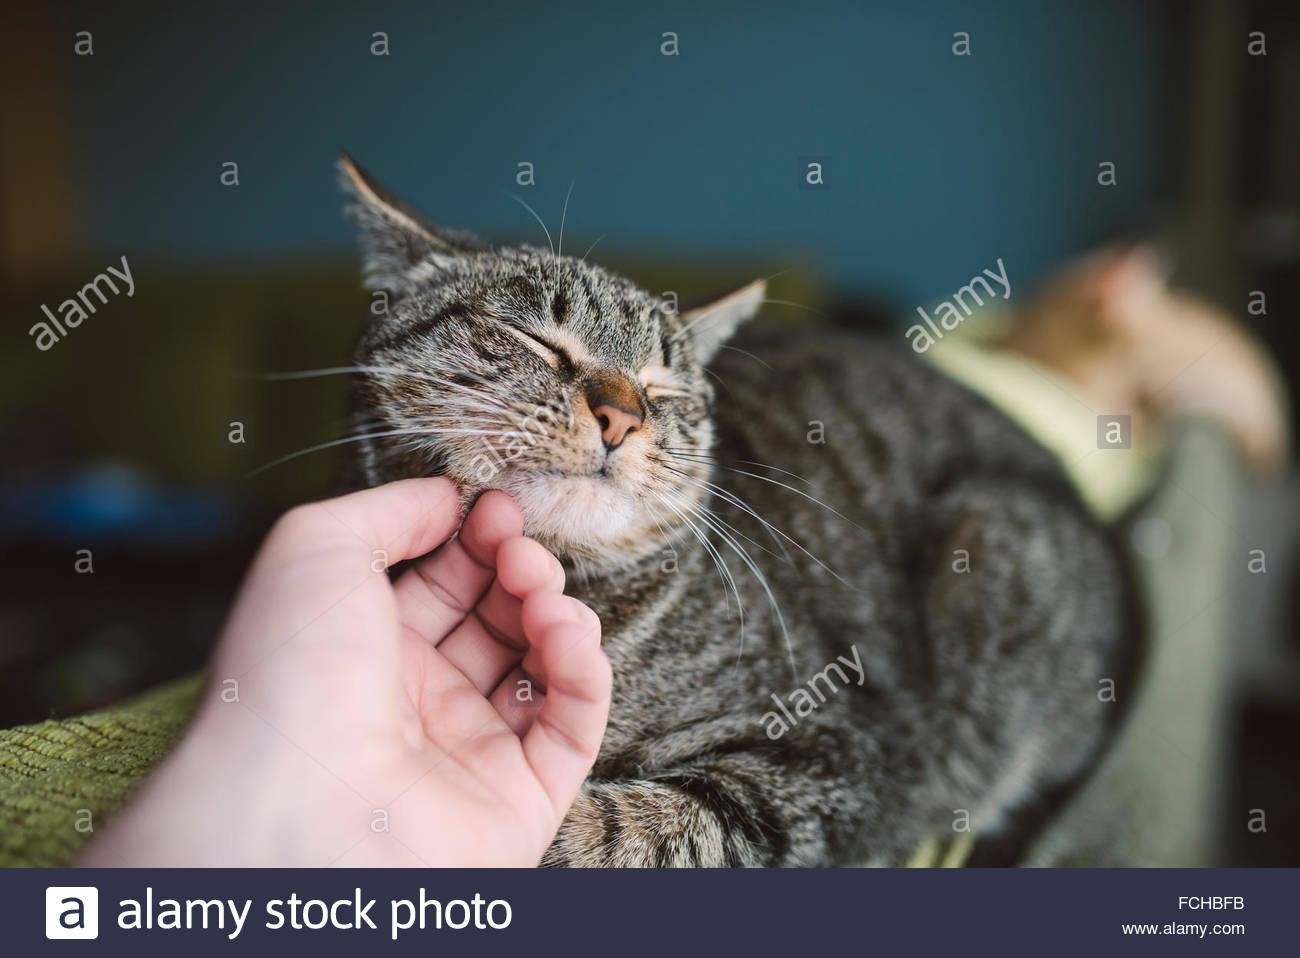 main-de-lhomme-caresser-chat-tigre-fchbfb.jpg